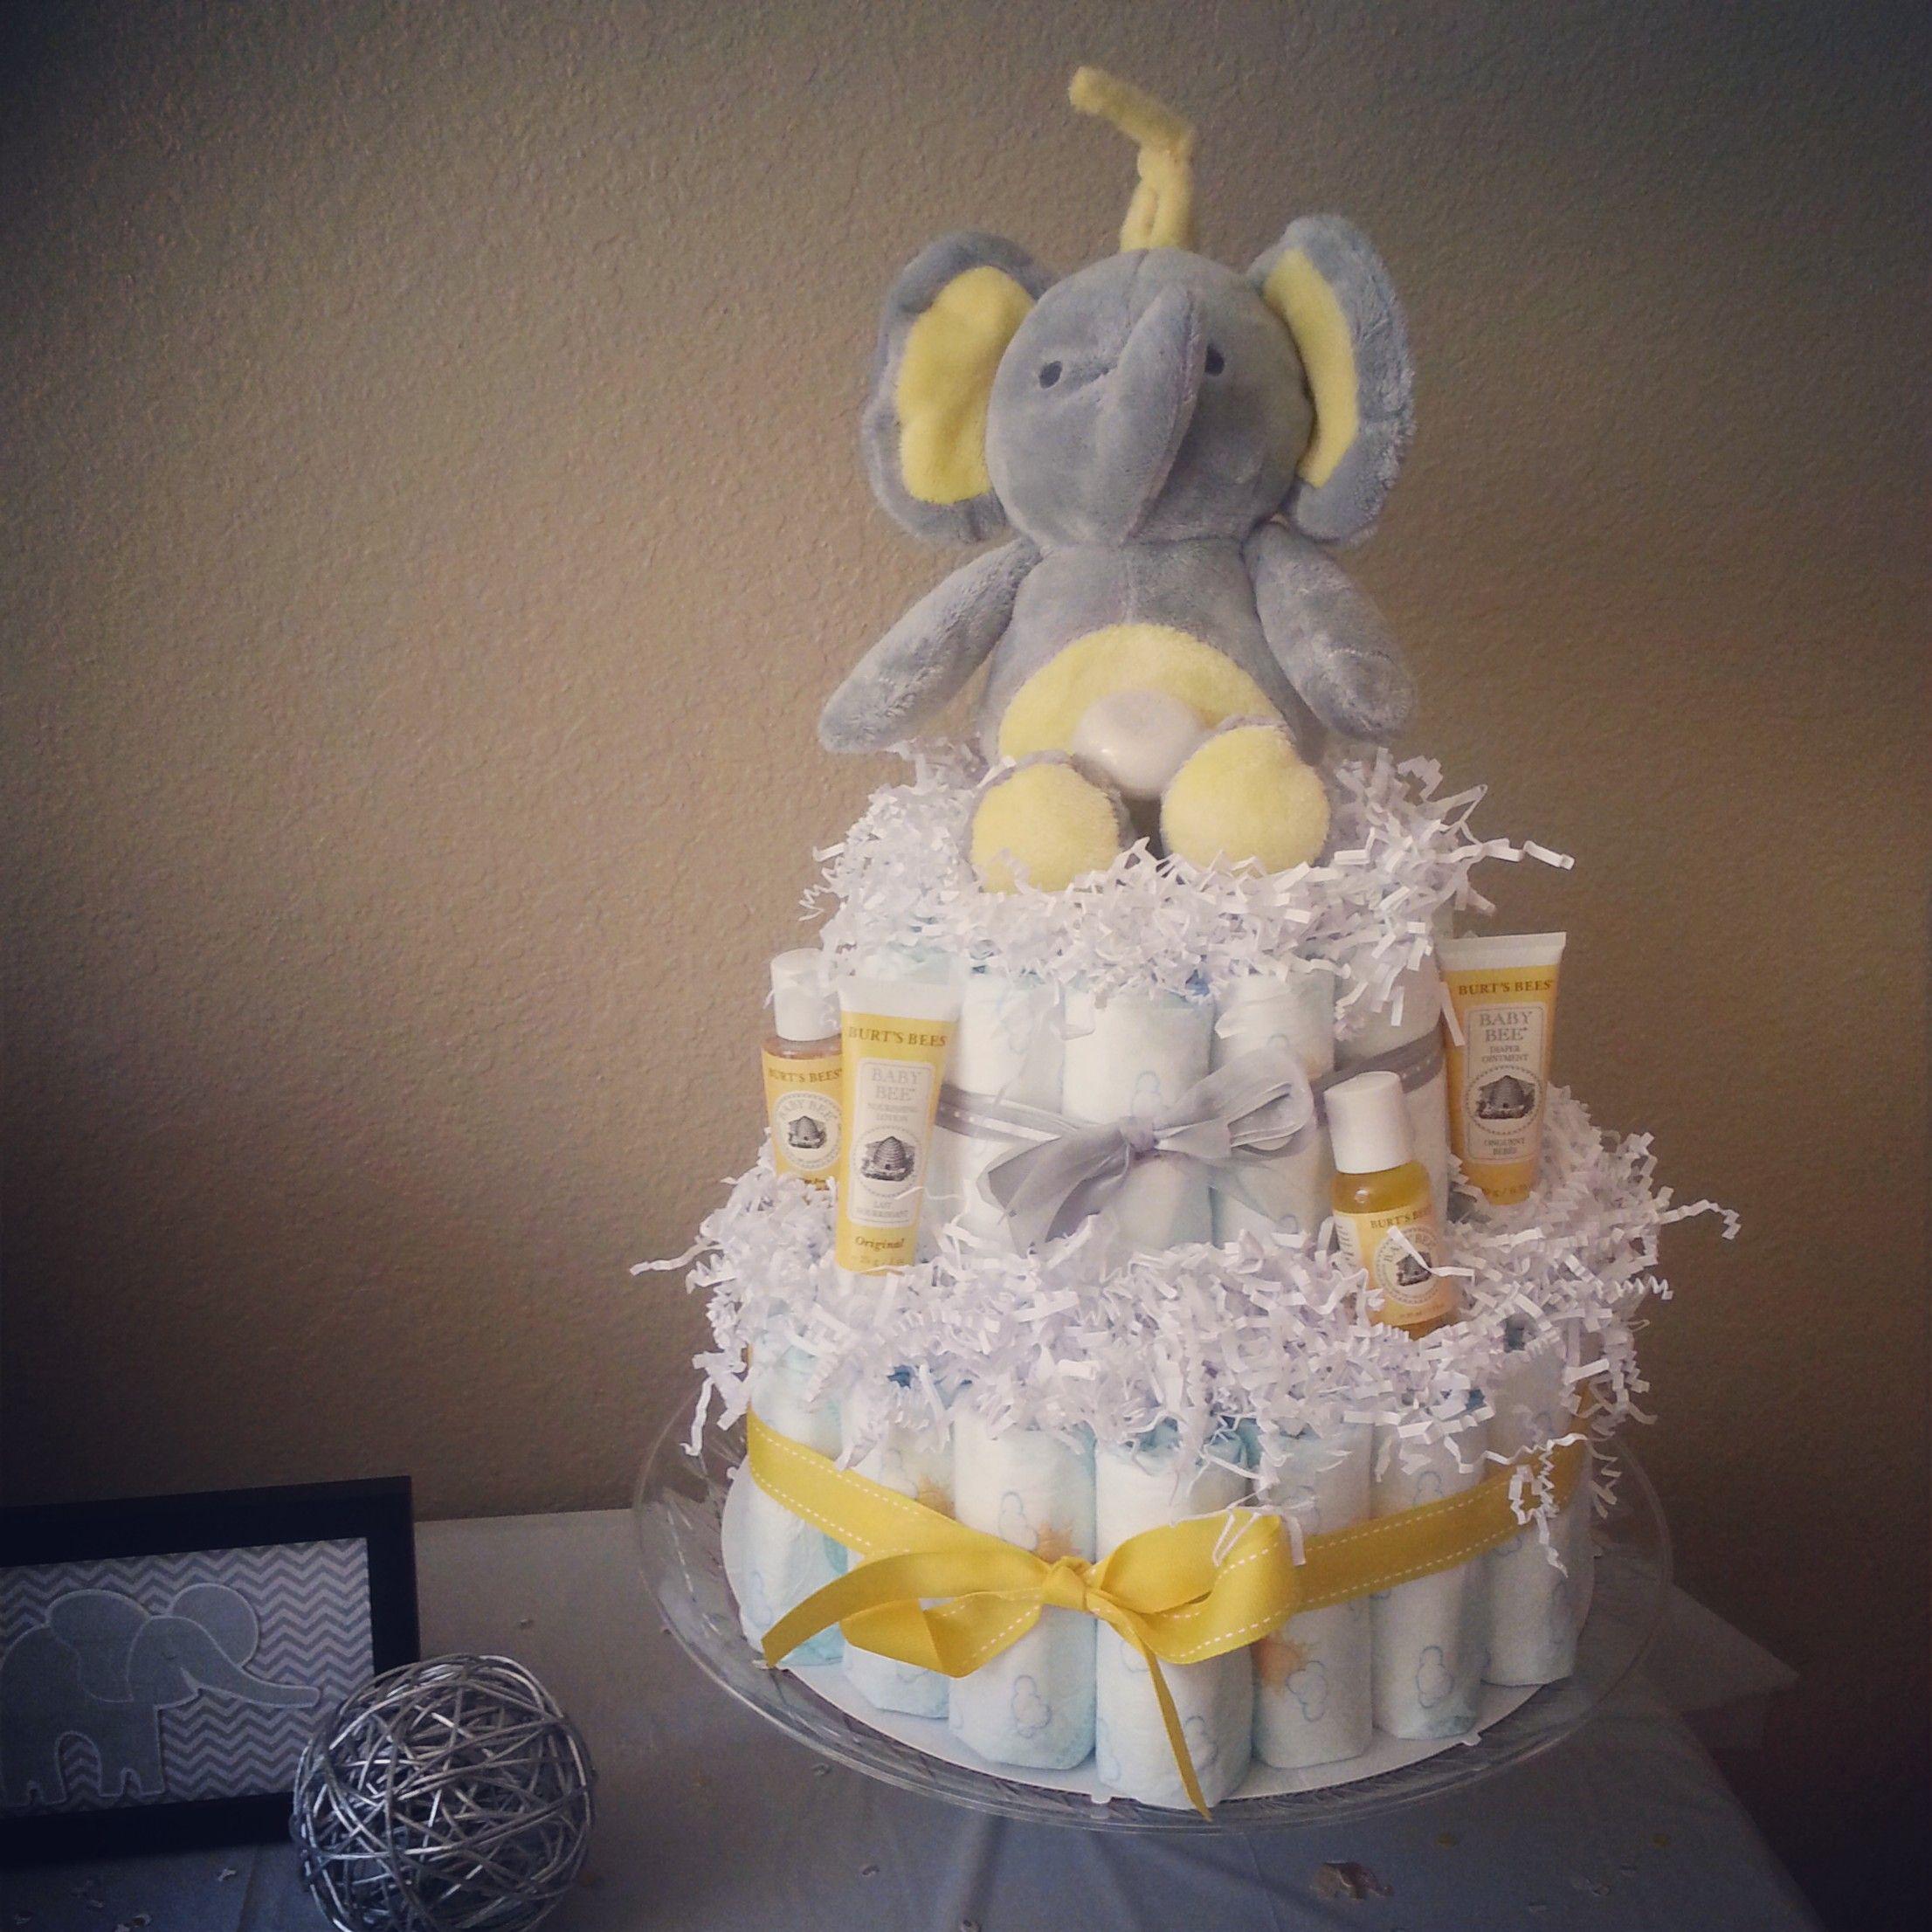 Gender neutral baby shower ideas pinterest - S J S Gray Yellow Gender Neutral Baby Shower By Apogee Events Elephant